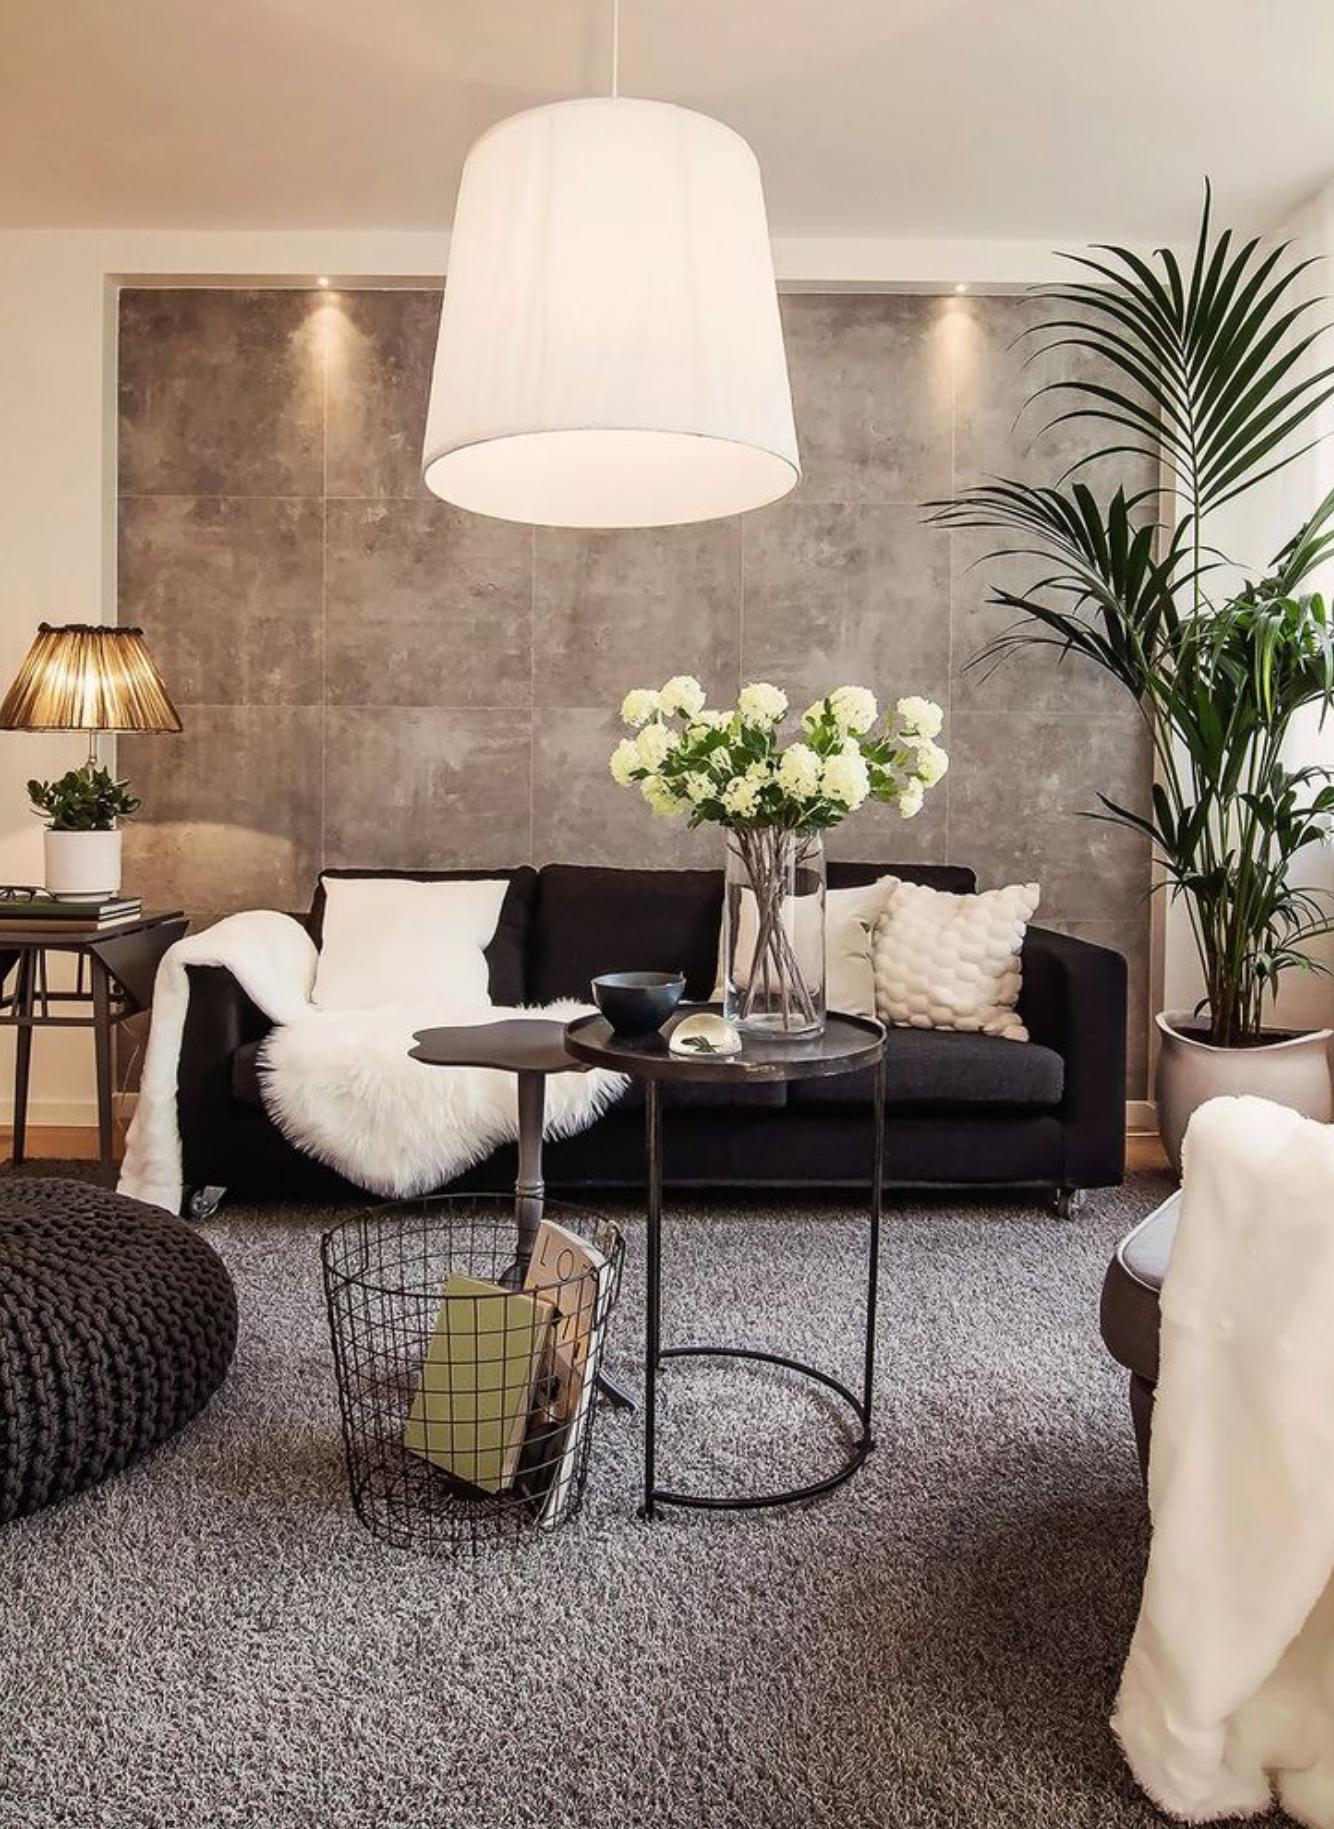 Deco Salon Canape Noir In 2020 White Living Room Decor Black And White Living Room Decor Black Couch Living Room